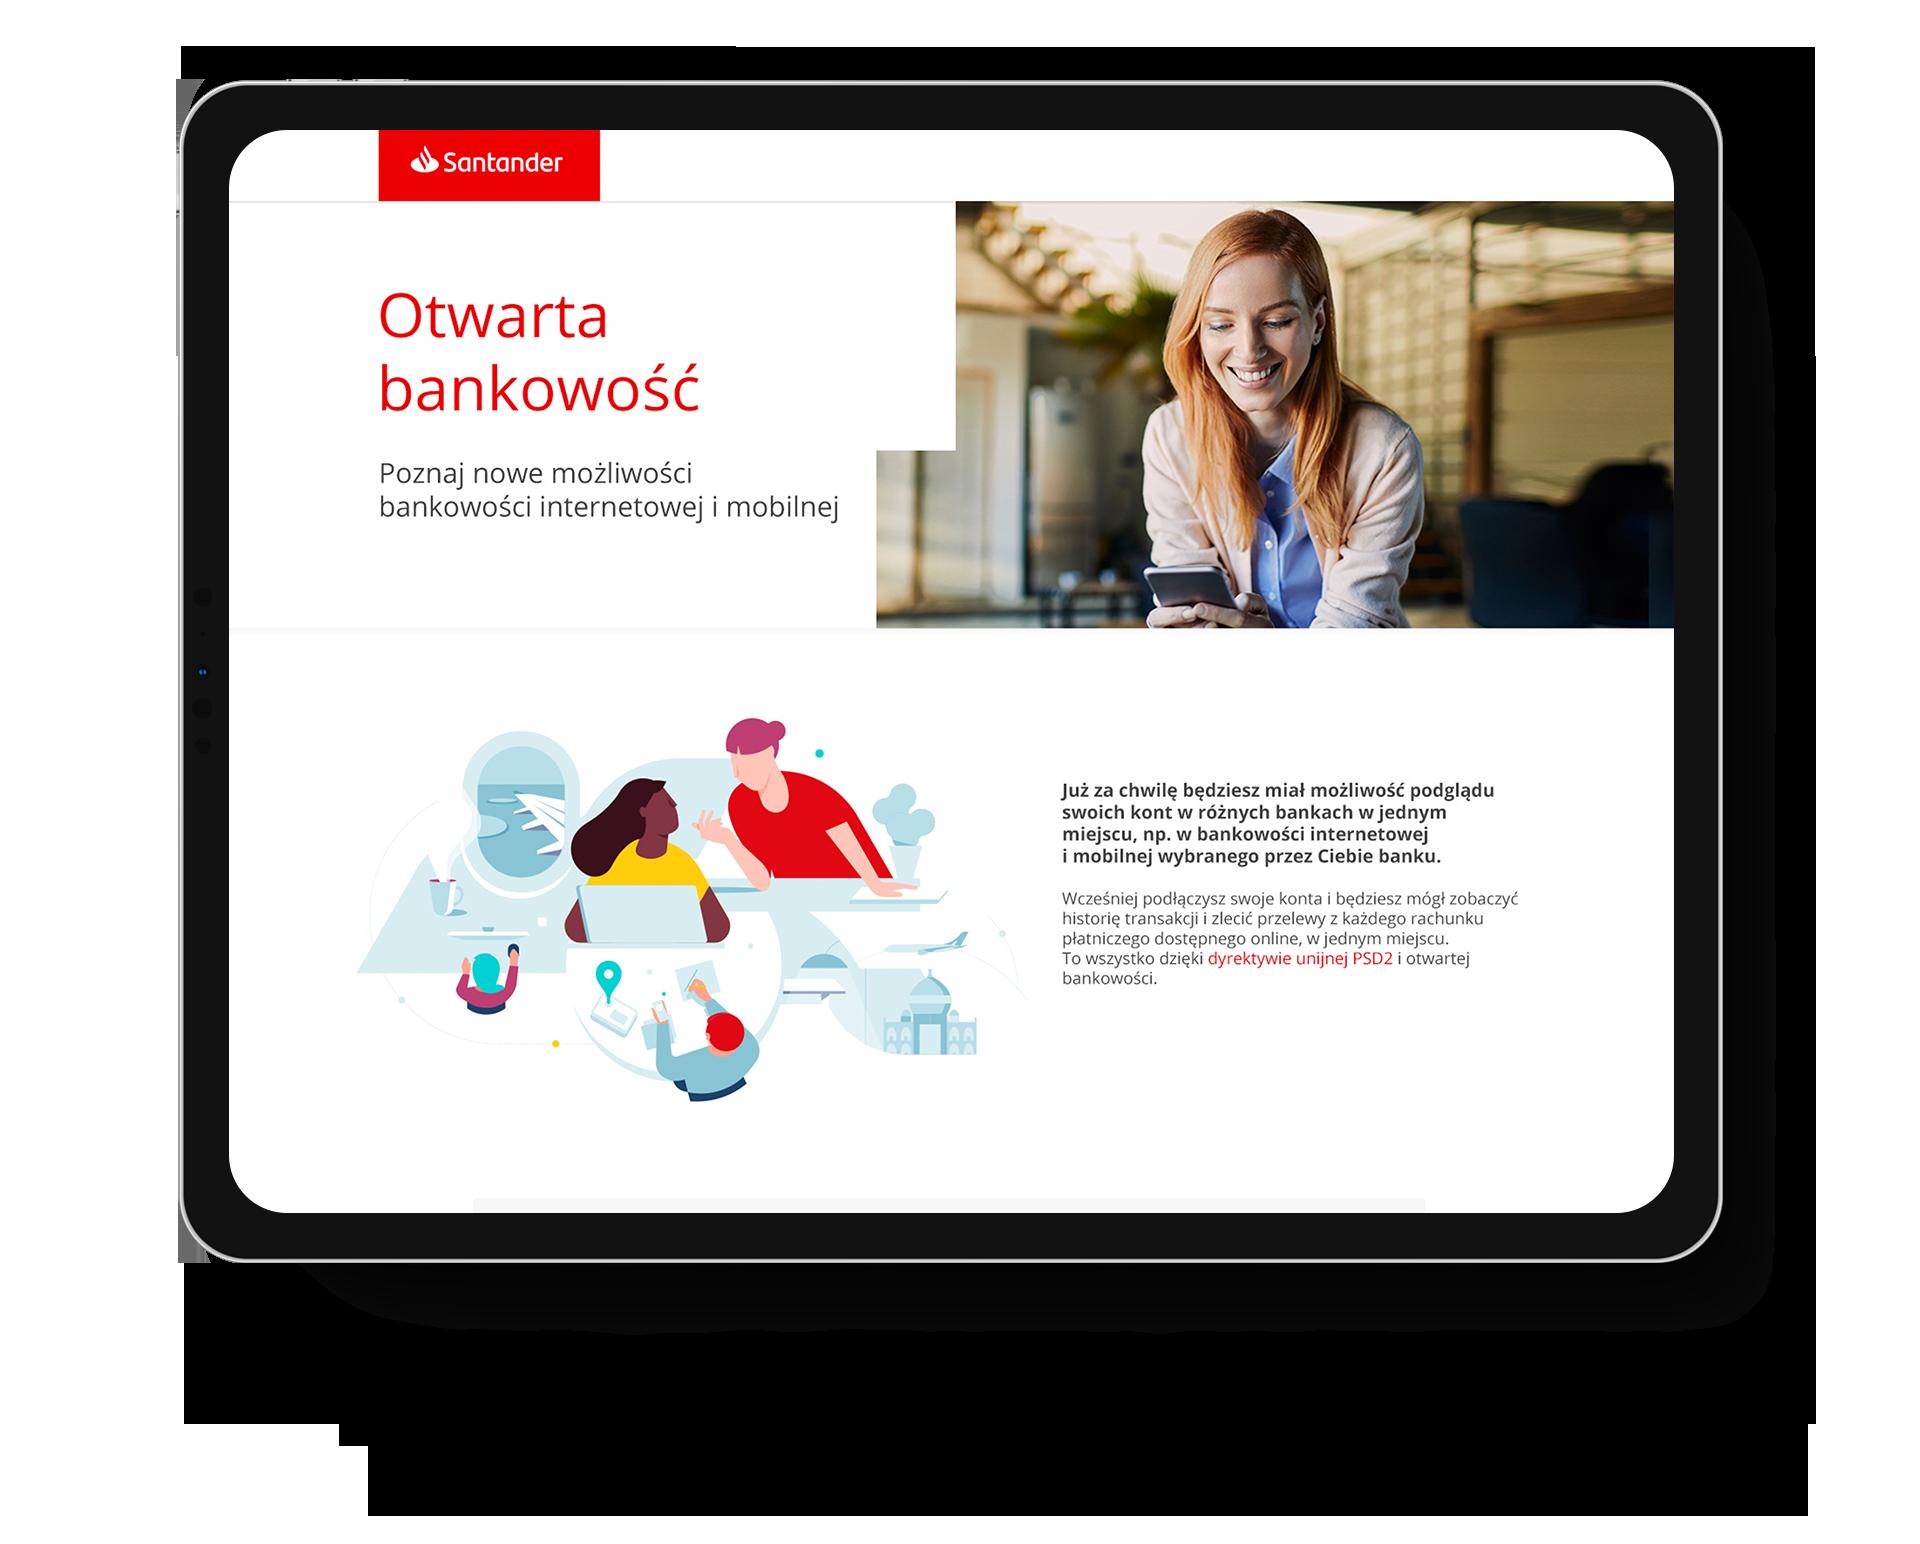 Santander Otwarta bankowość